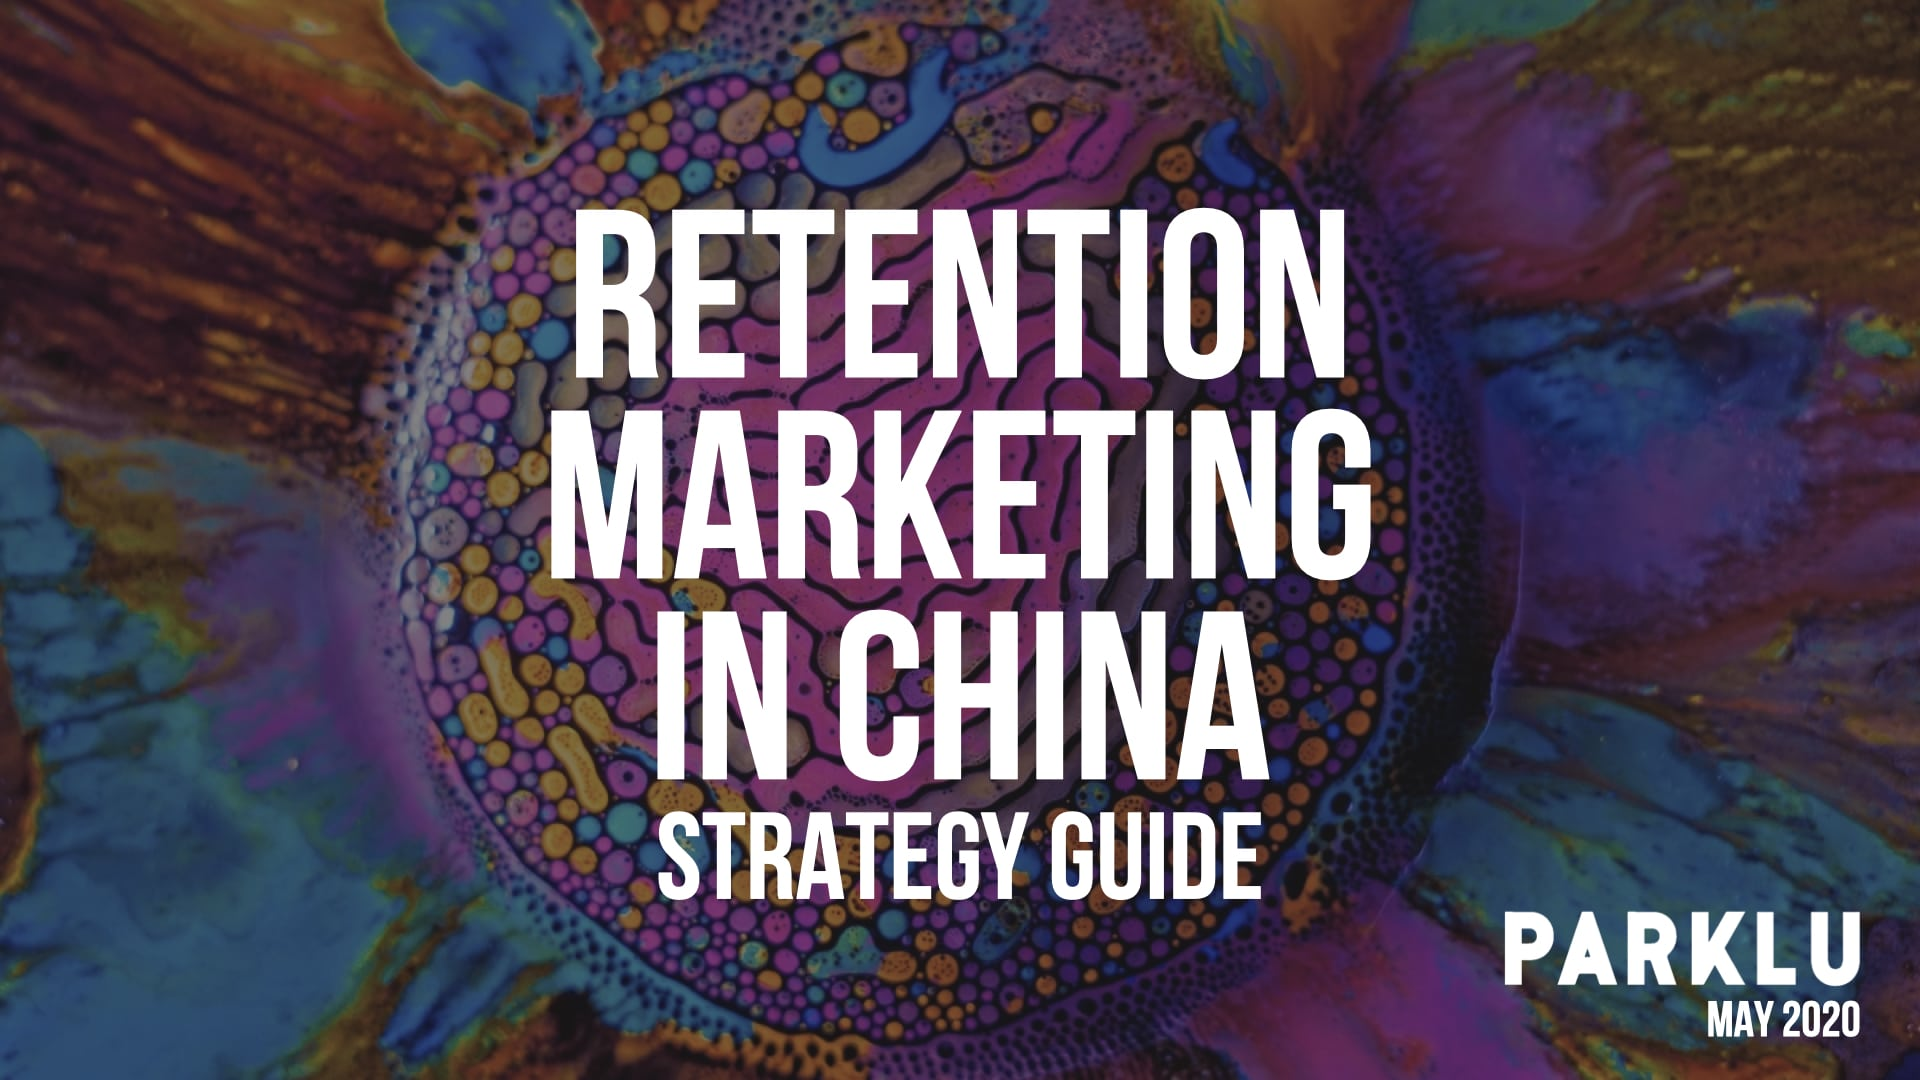 PARKLU Retention Marketing Strategy Guide